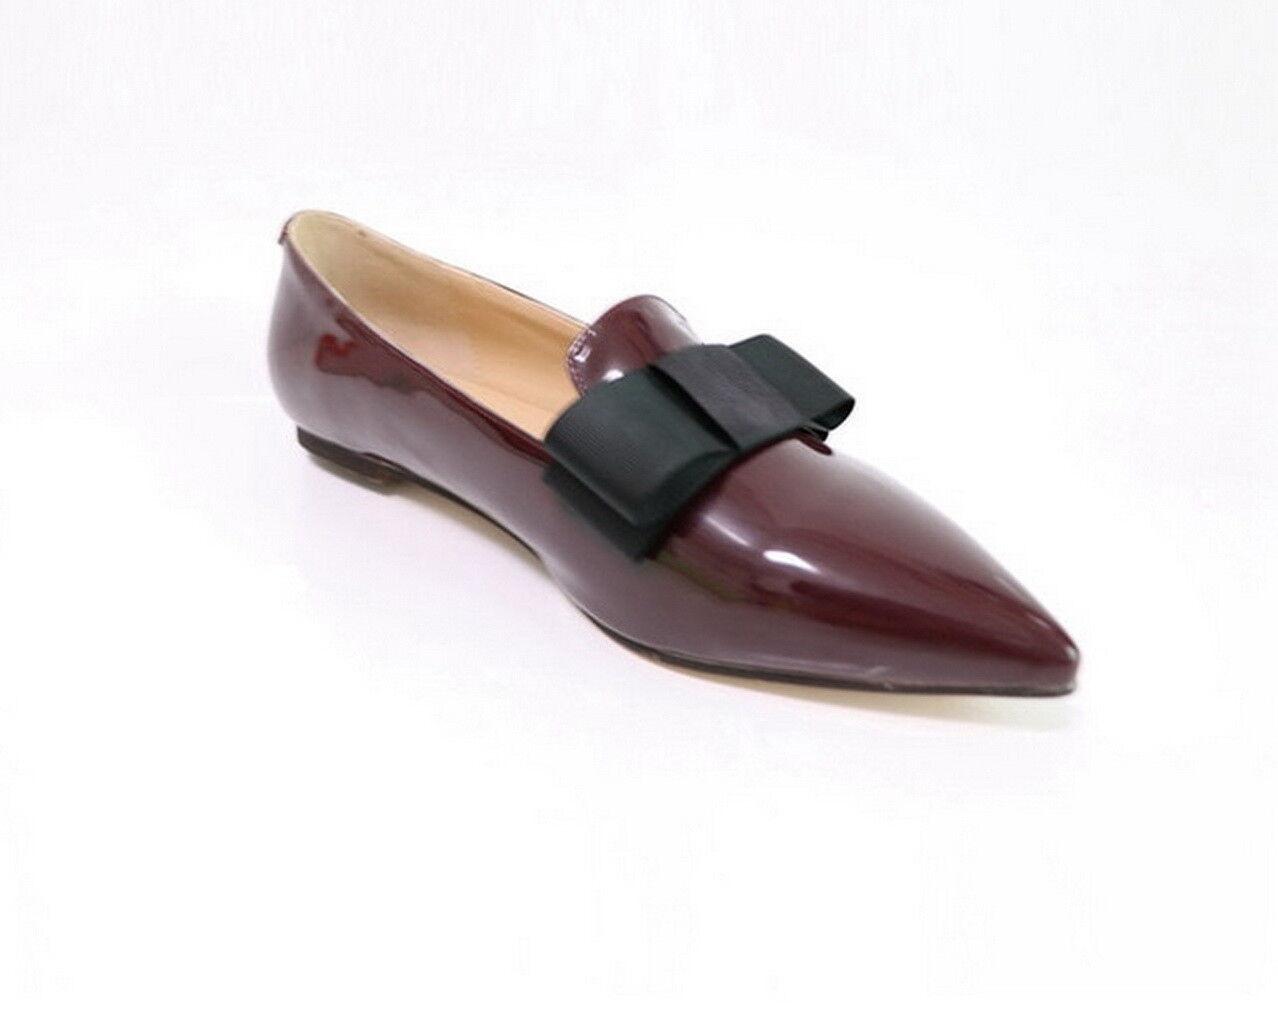 New Handmade damen damen damen Unique Bow Style Leather schuhe Wooden Heel and Leather sole 750abe